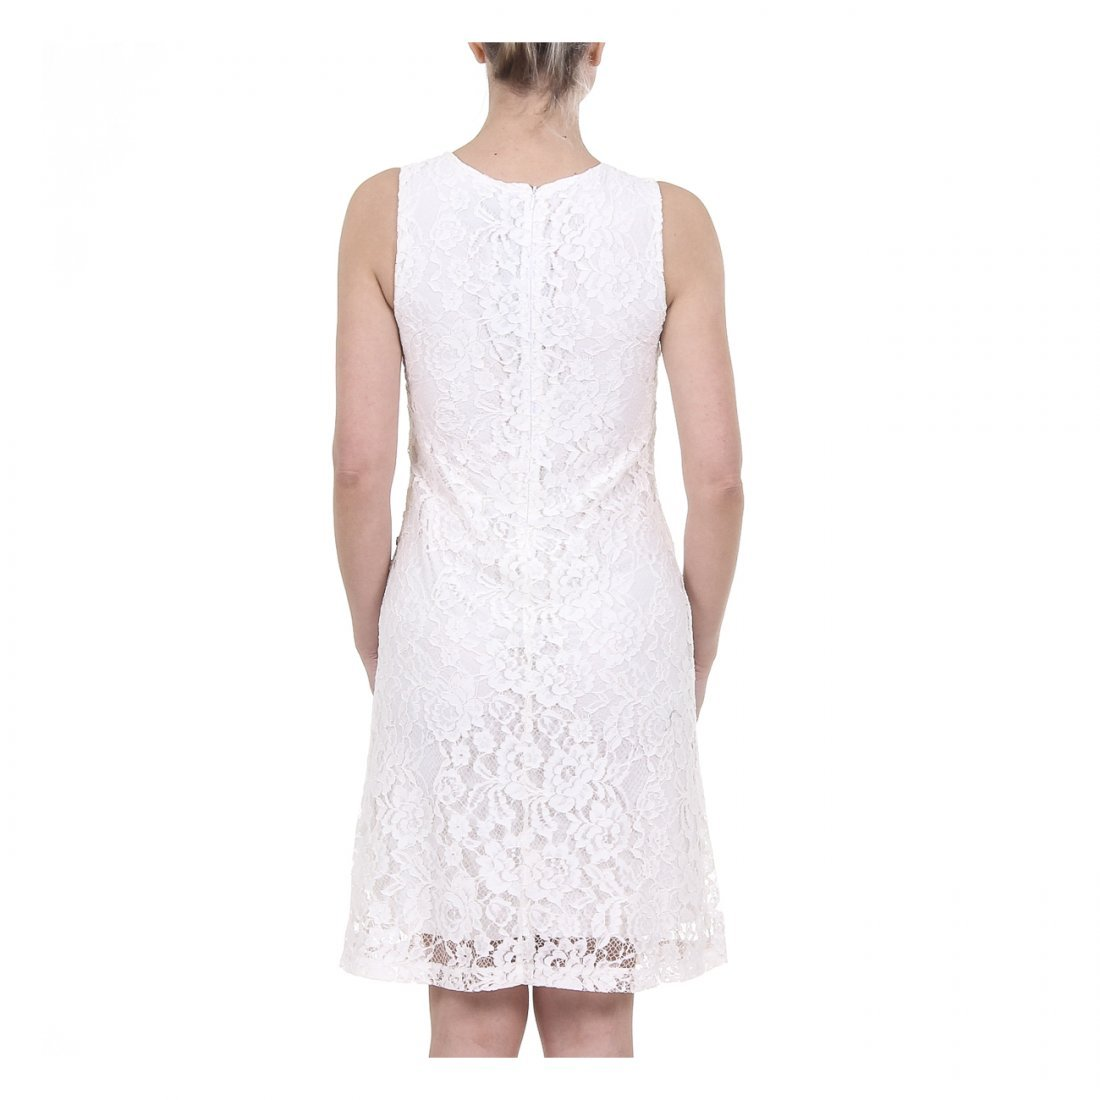 Ladies VERSACE 1969 White Summer Dress - 3